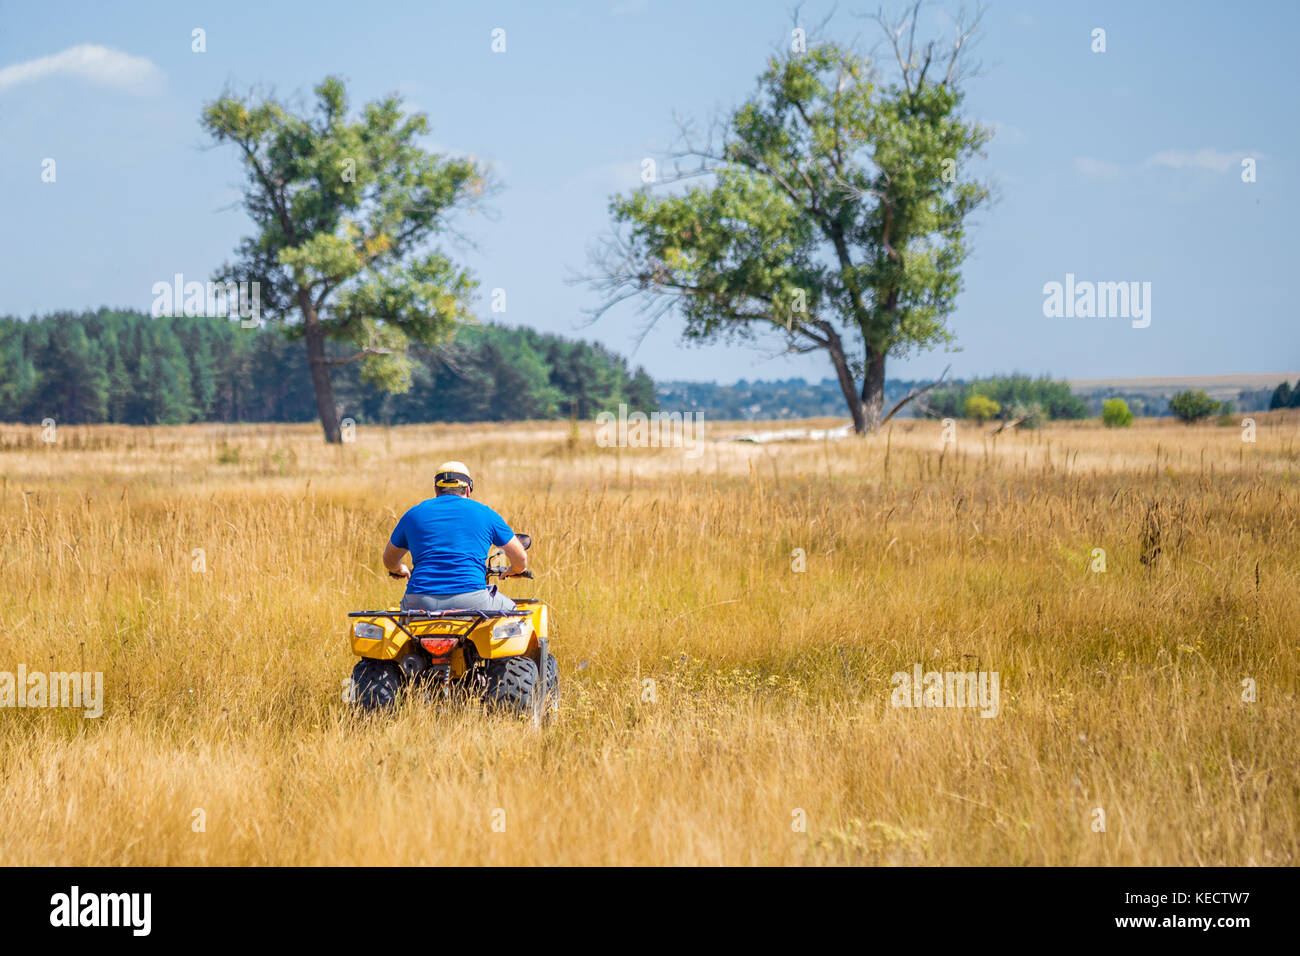 Caucasian Man In Sport Protective Goggles Riding An Atv Quad Bike